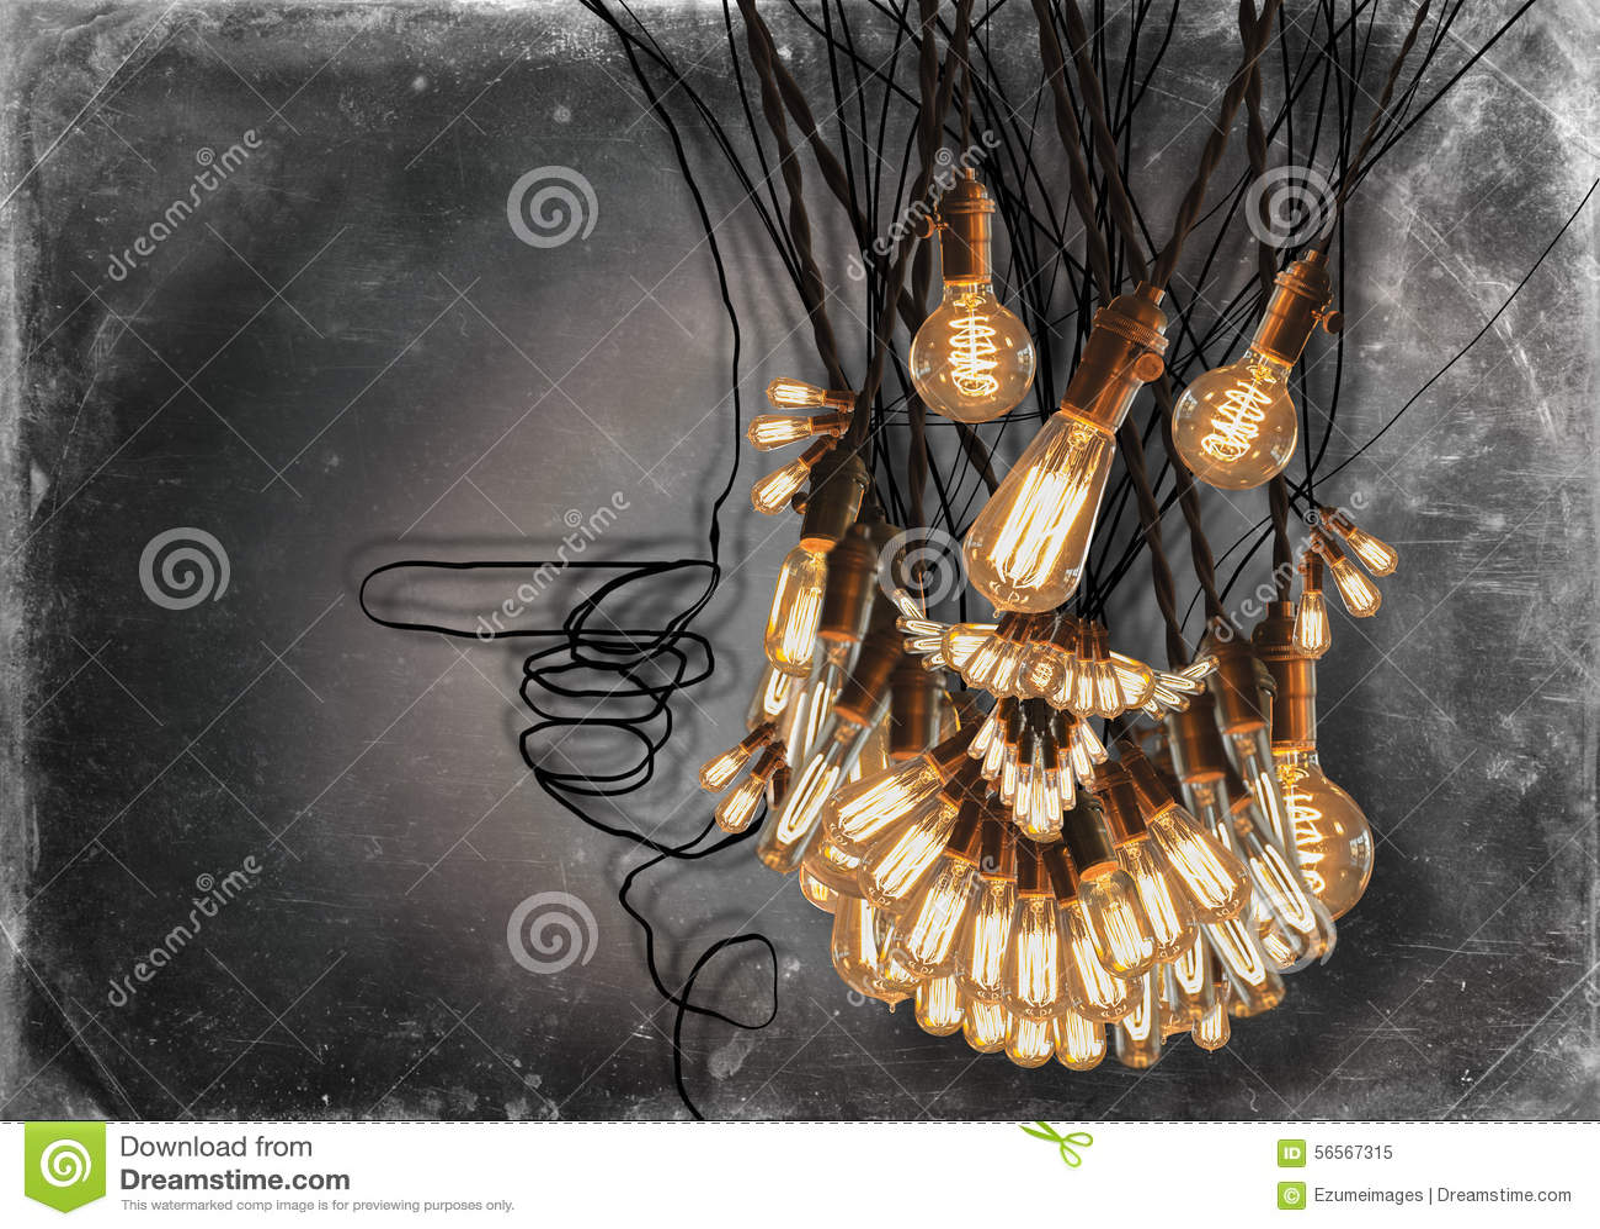 Download Edison Lightbulbs Beard στοκ εικόνα. εικόνα από φω, έξυπνο - 56567315